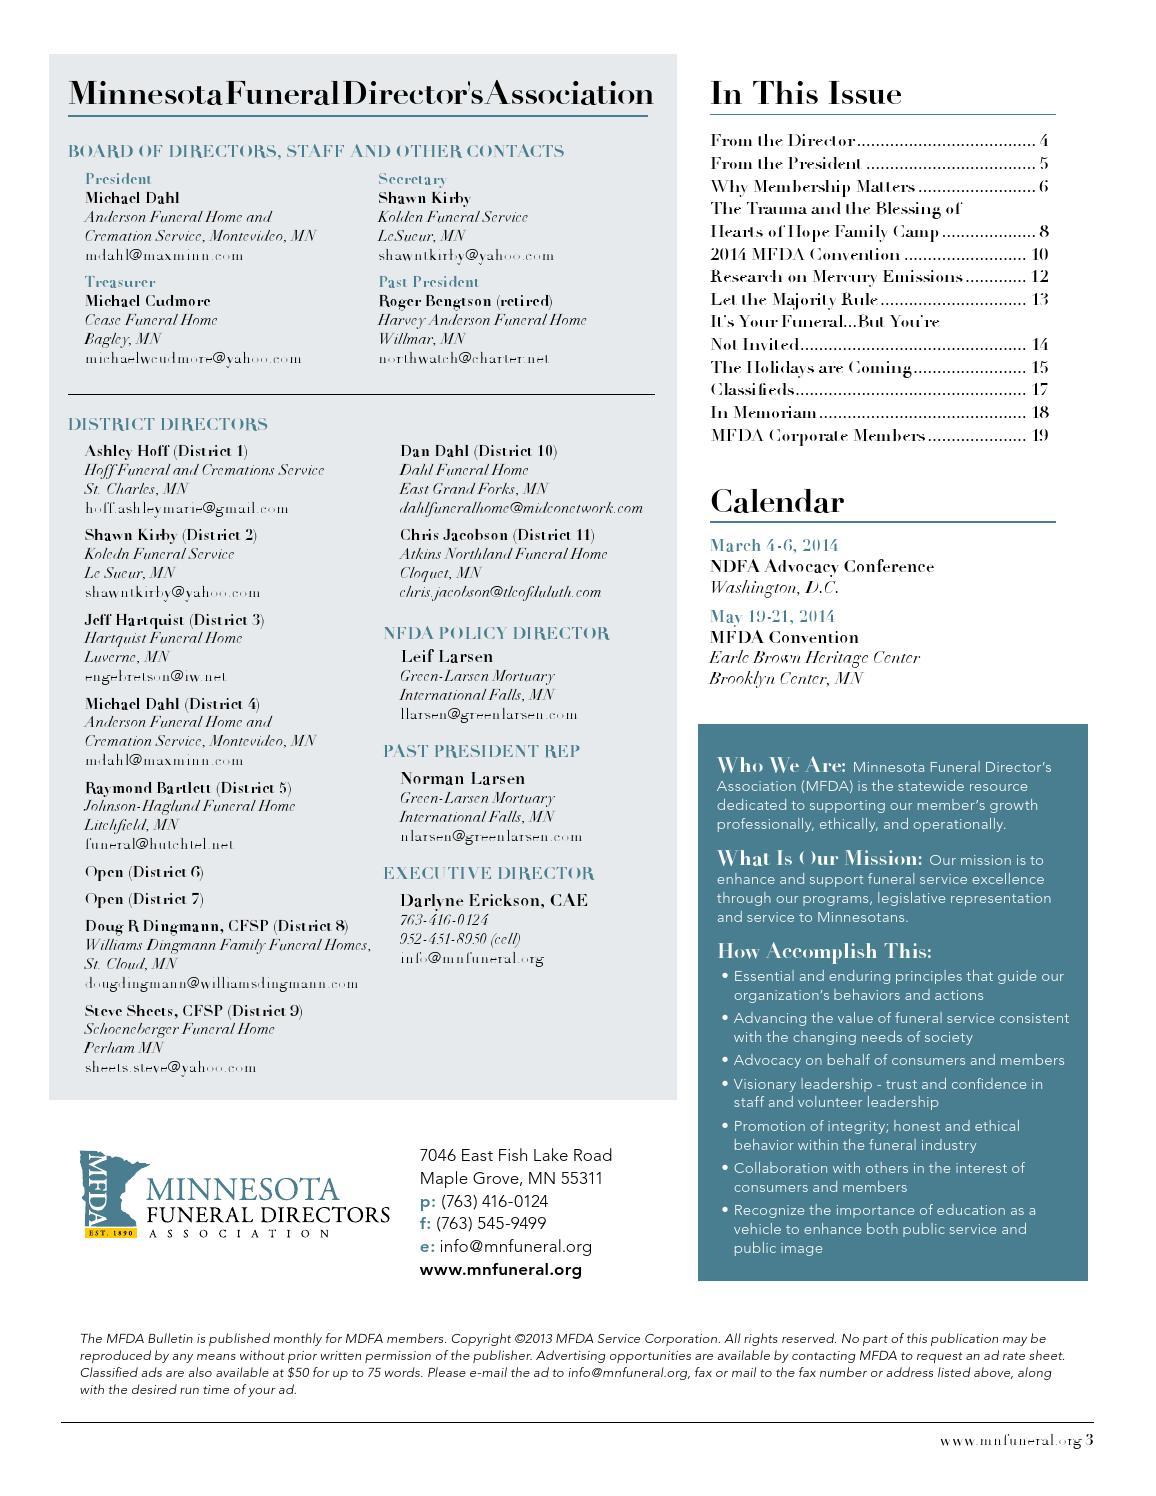 Minnesota Funeral Directors Association Bulletin By Pernsteiner